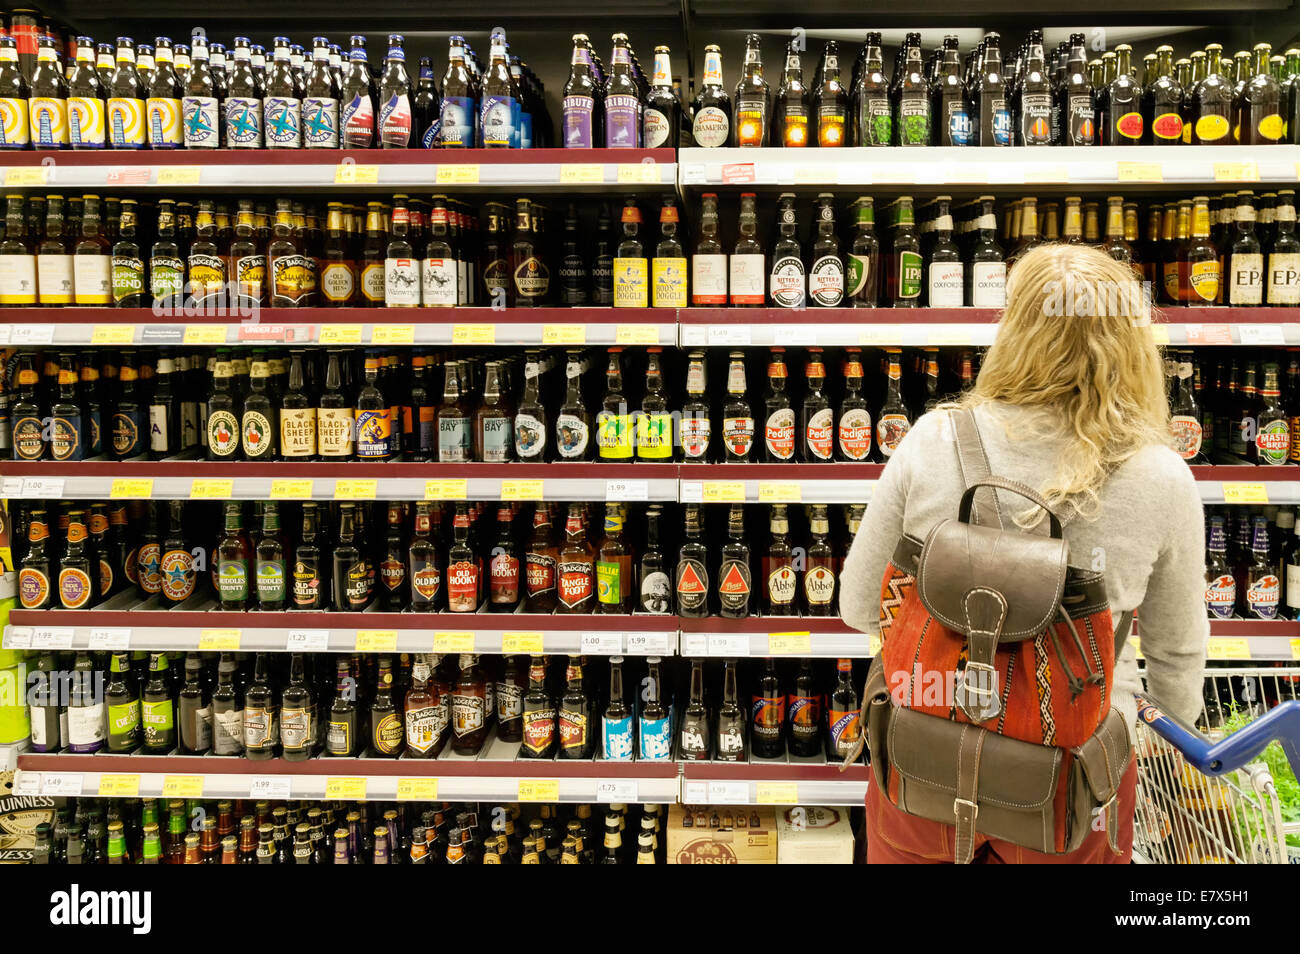 Tesco 73719213 Buying Supermarket Shopping Alamy Bottled For Blonde - Beer Photo Woman Stock